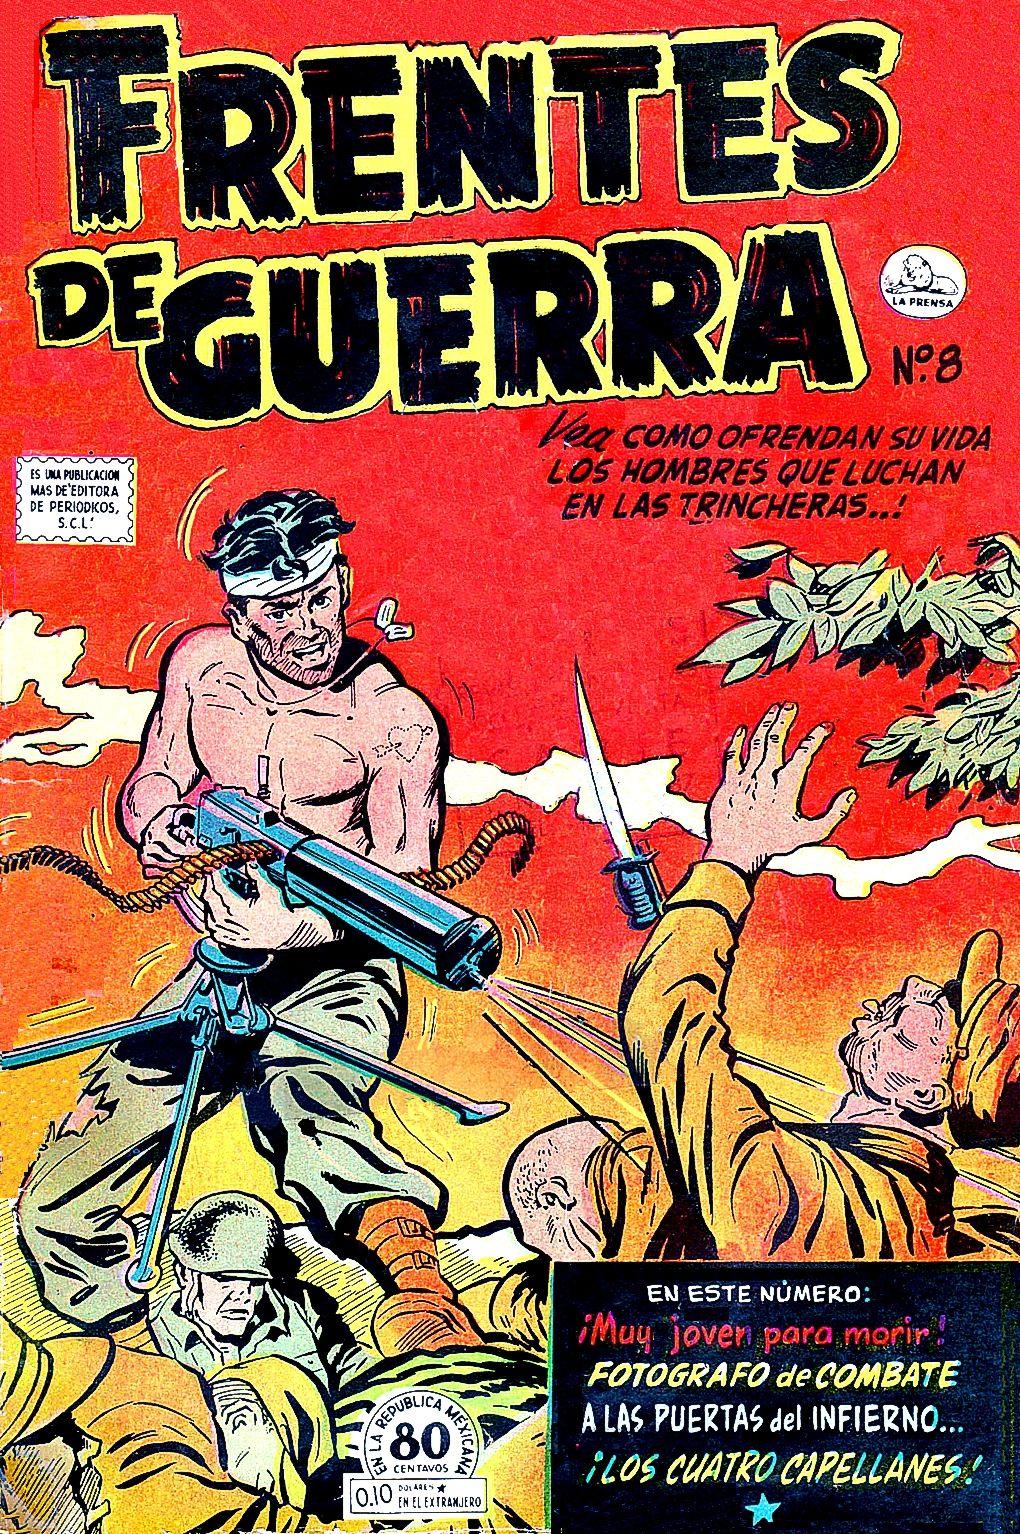 COMICS DE LA PRENSA: Historietas clásicas de colección para descarga directa